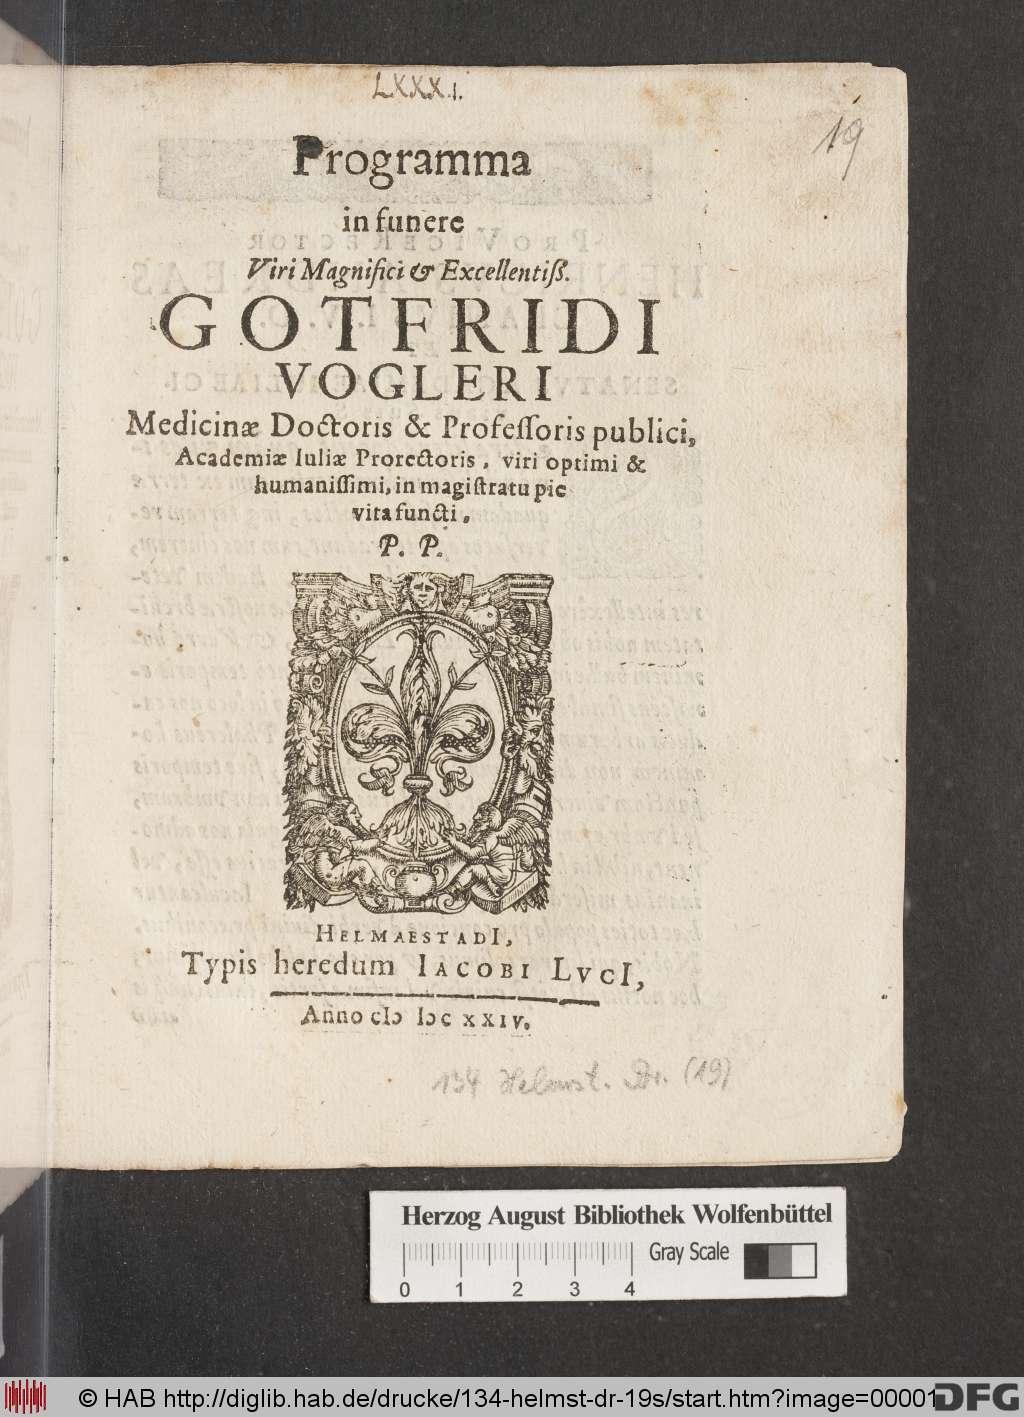 http://diglib.hab.de/drucke/134-helmst-dr-19s/00001.jpg